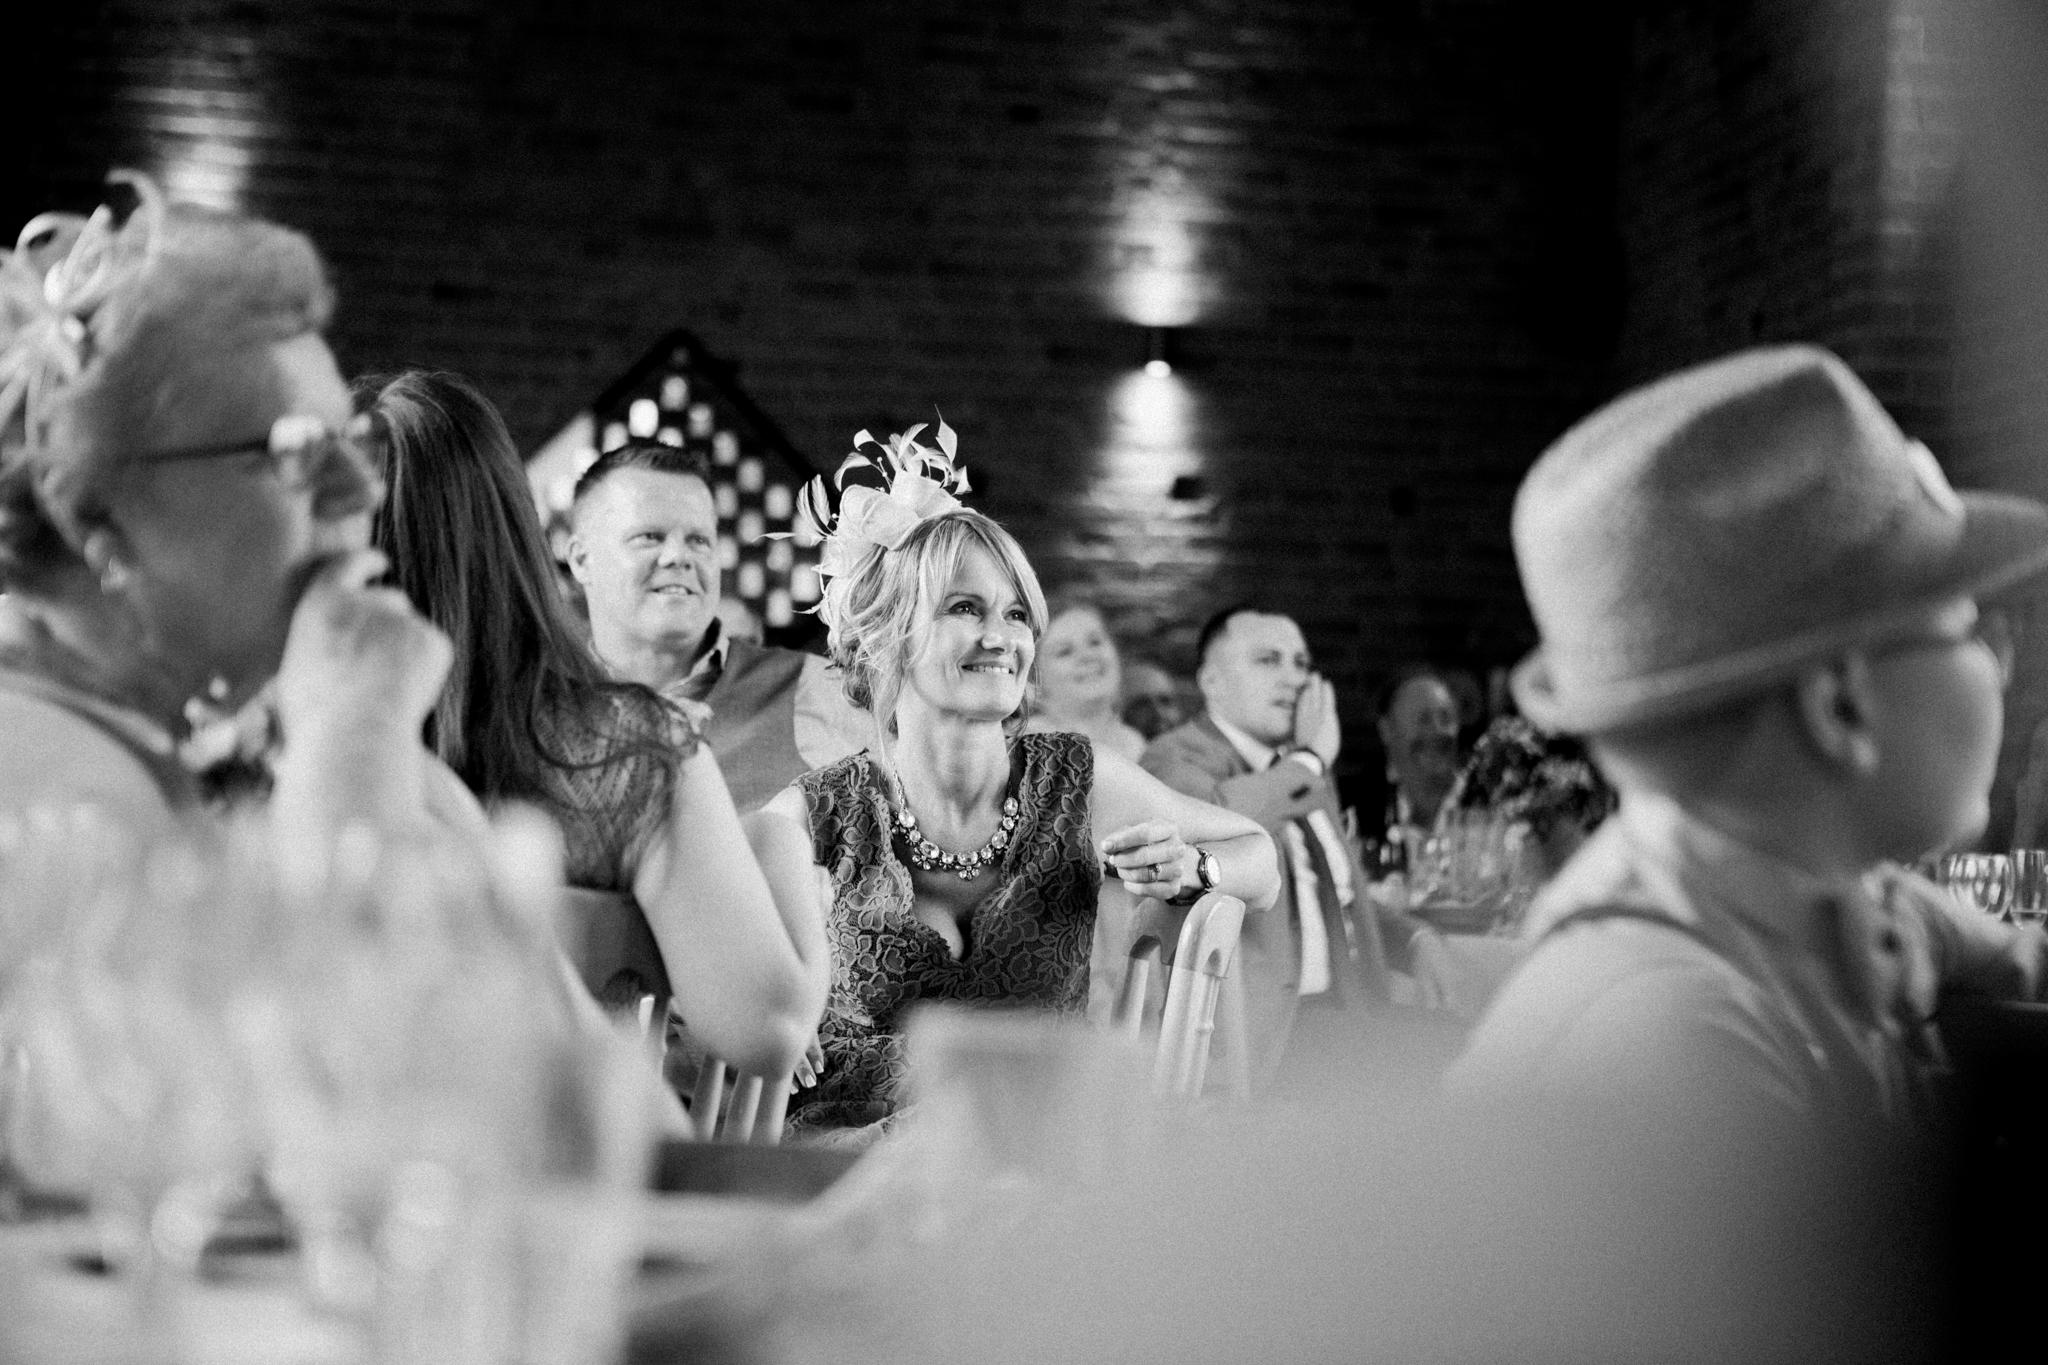 Rowsie & Lee, Swallows Nest Barn Wedding, Cotswold wedding photographer, Warwickshire Wedding Photographer-138.jpg